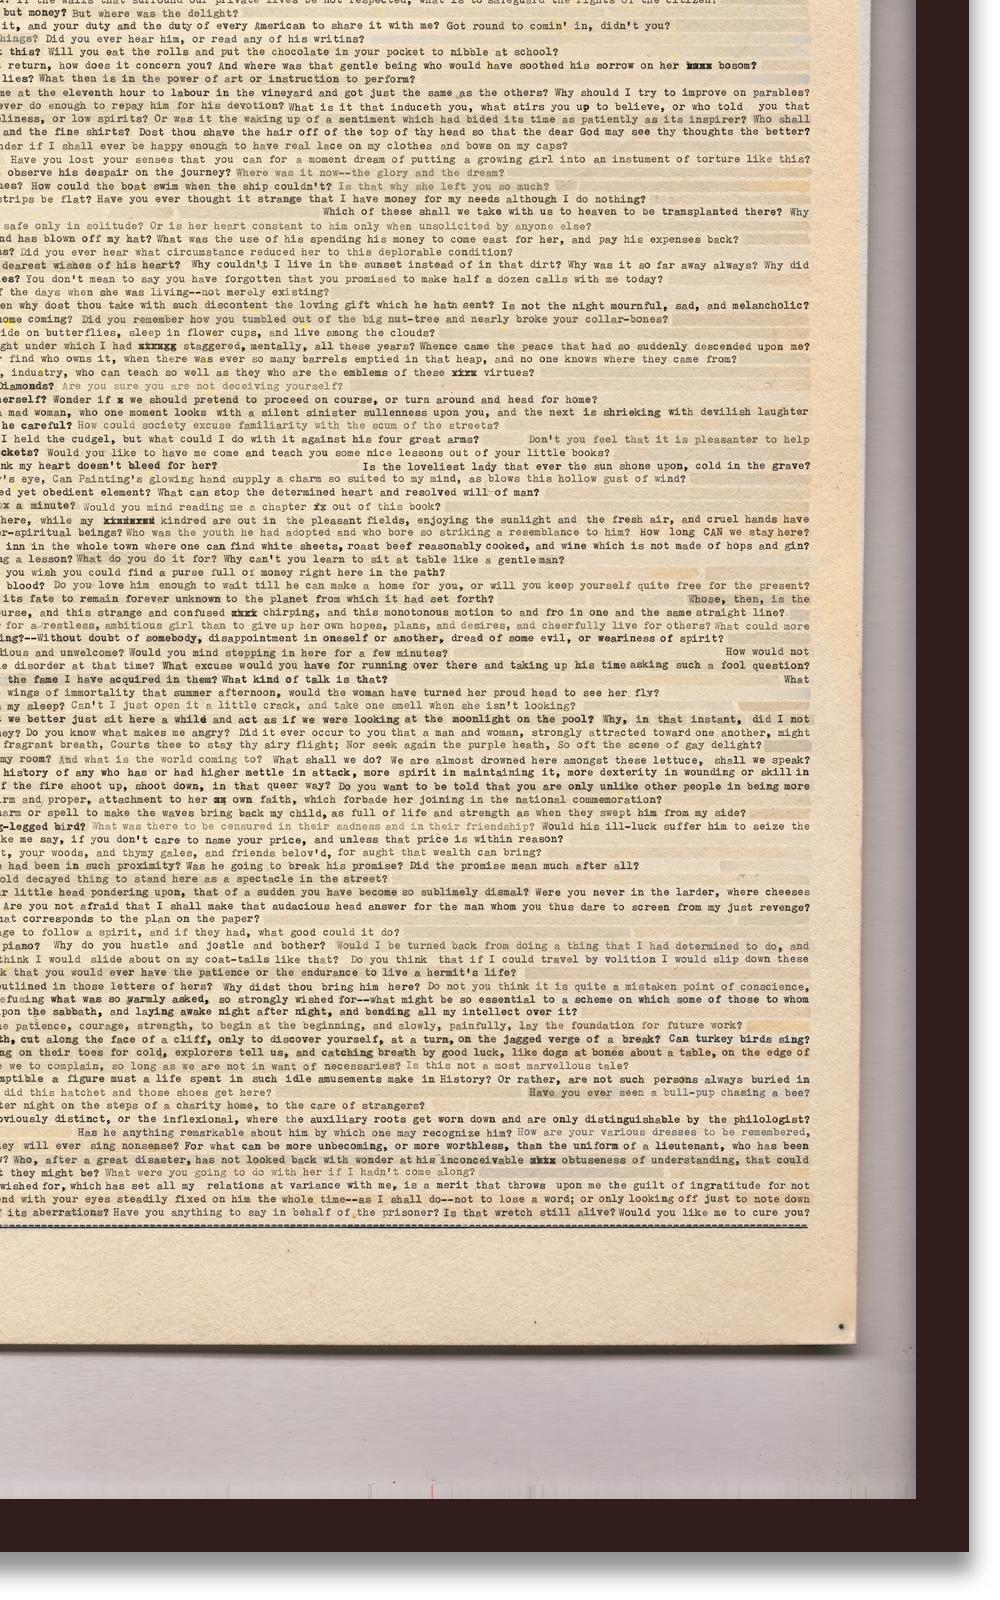 Case Simmons, Simmons & Burke, Score Collage Poem #3, SMMoA, Santa Monica Museum of Art,Digital Collage,Digital Art, Case Simmons Art, Text Art, Font Art, Typewriter Art, Photoshop Collage, Livrivox, Fiction Art, Internet Archive